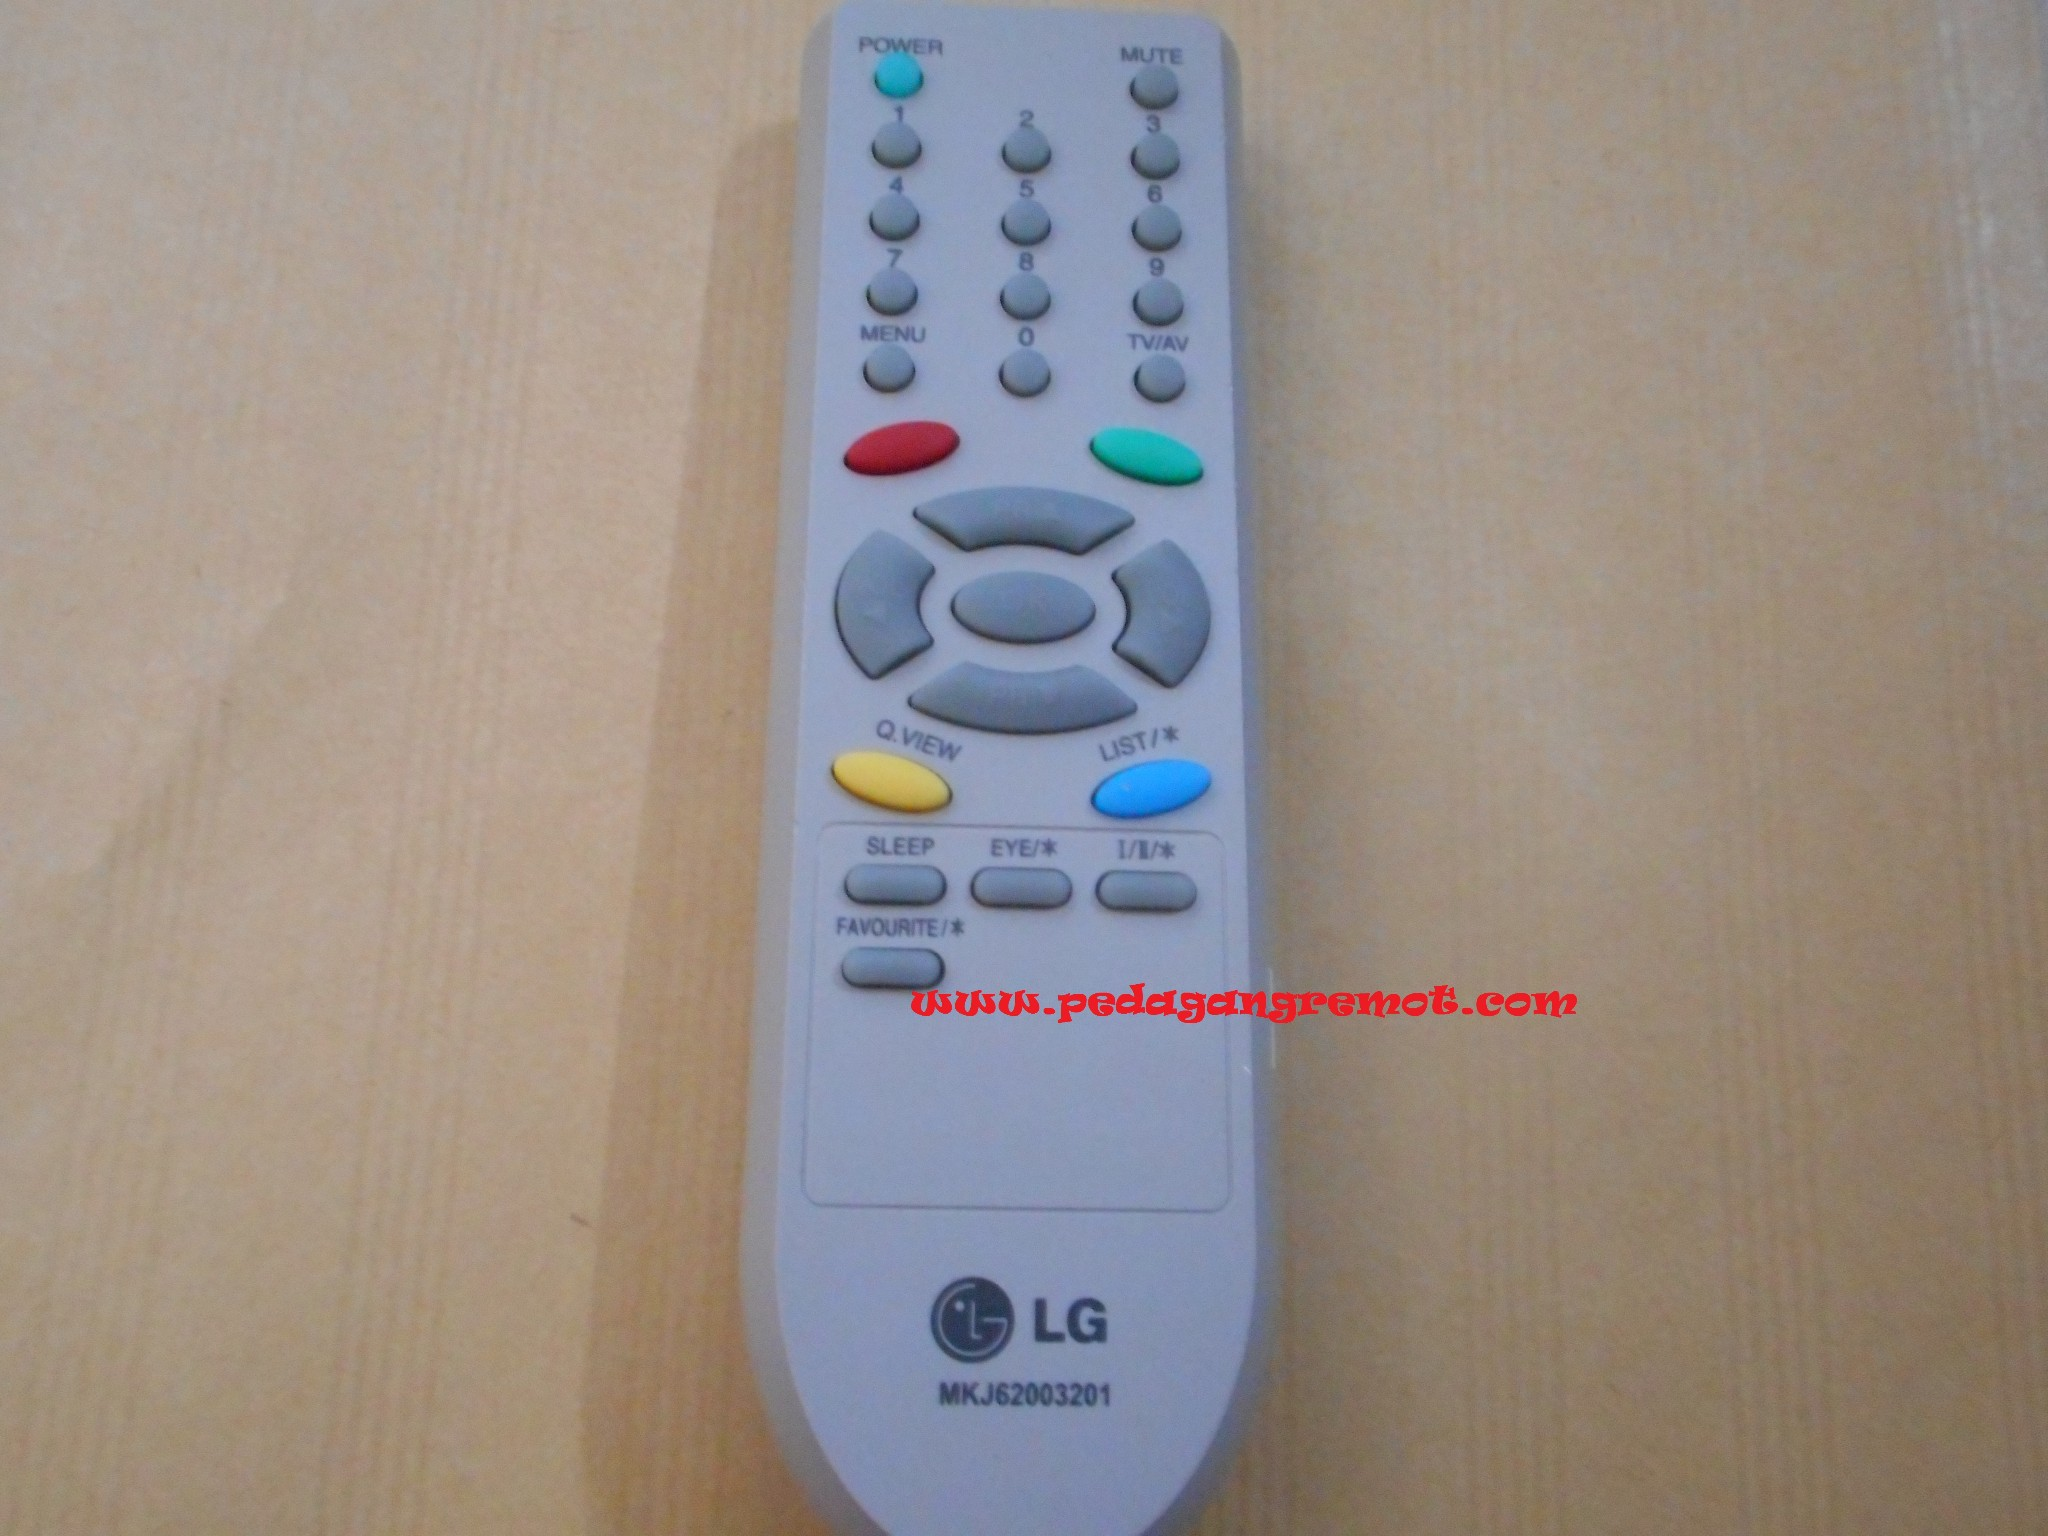 Jual Remot Remote Tv Tabung Crt Lg Original Mkj62003201 Pedagang